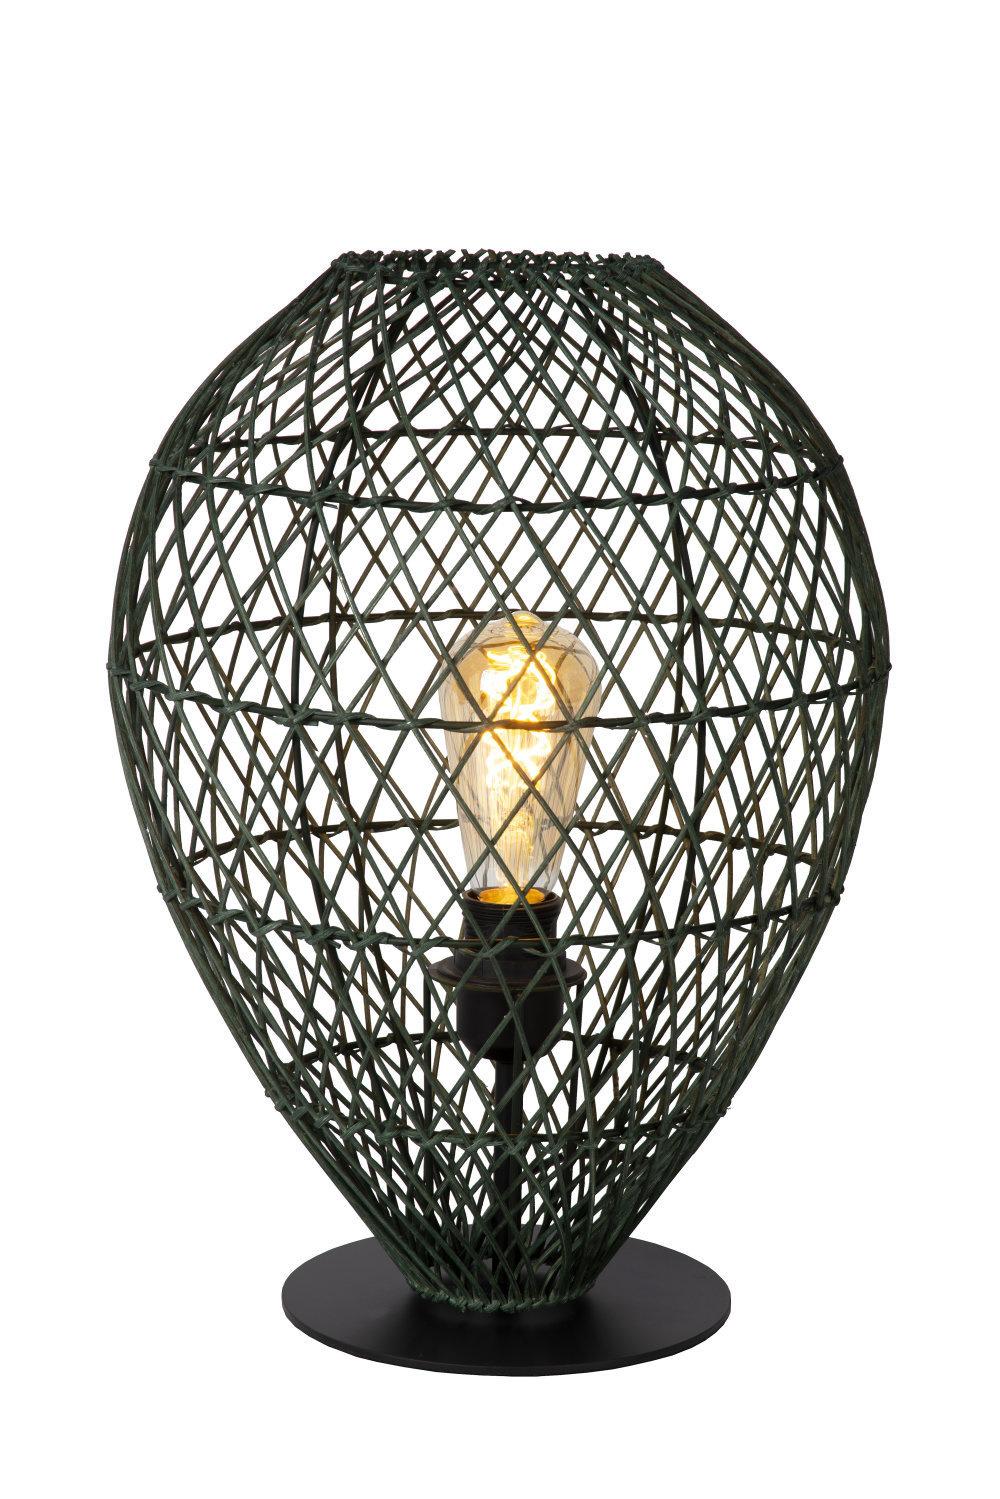 Lucide KENJIRO Tafellamp-Groen-Ø30-1xE27-40W-Rotan